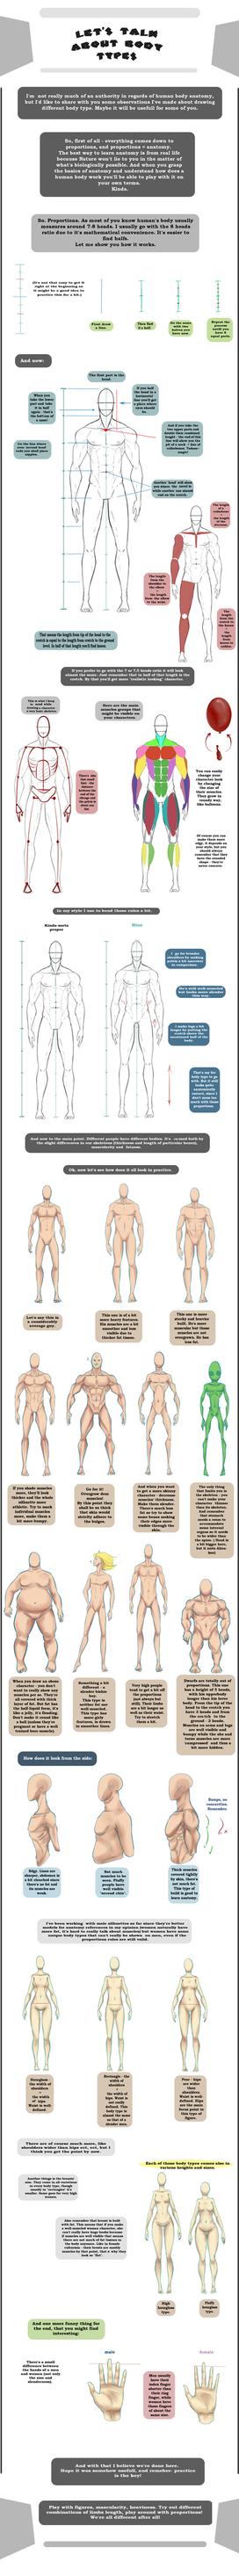 Body Types tutorial by Antarija